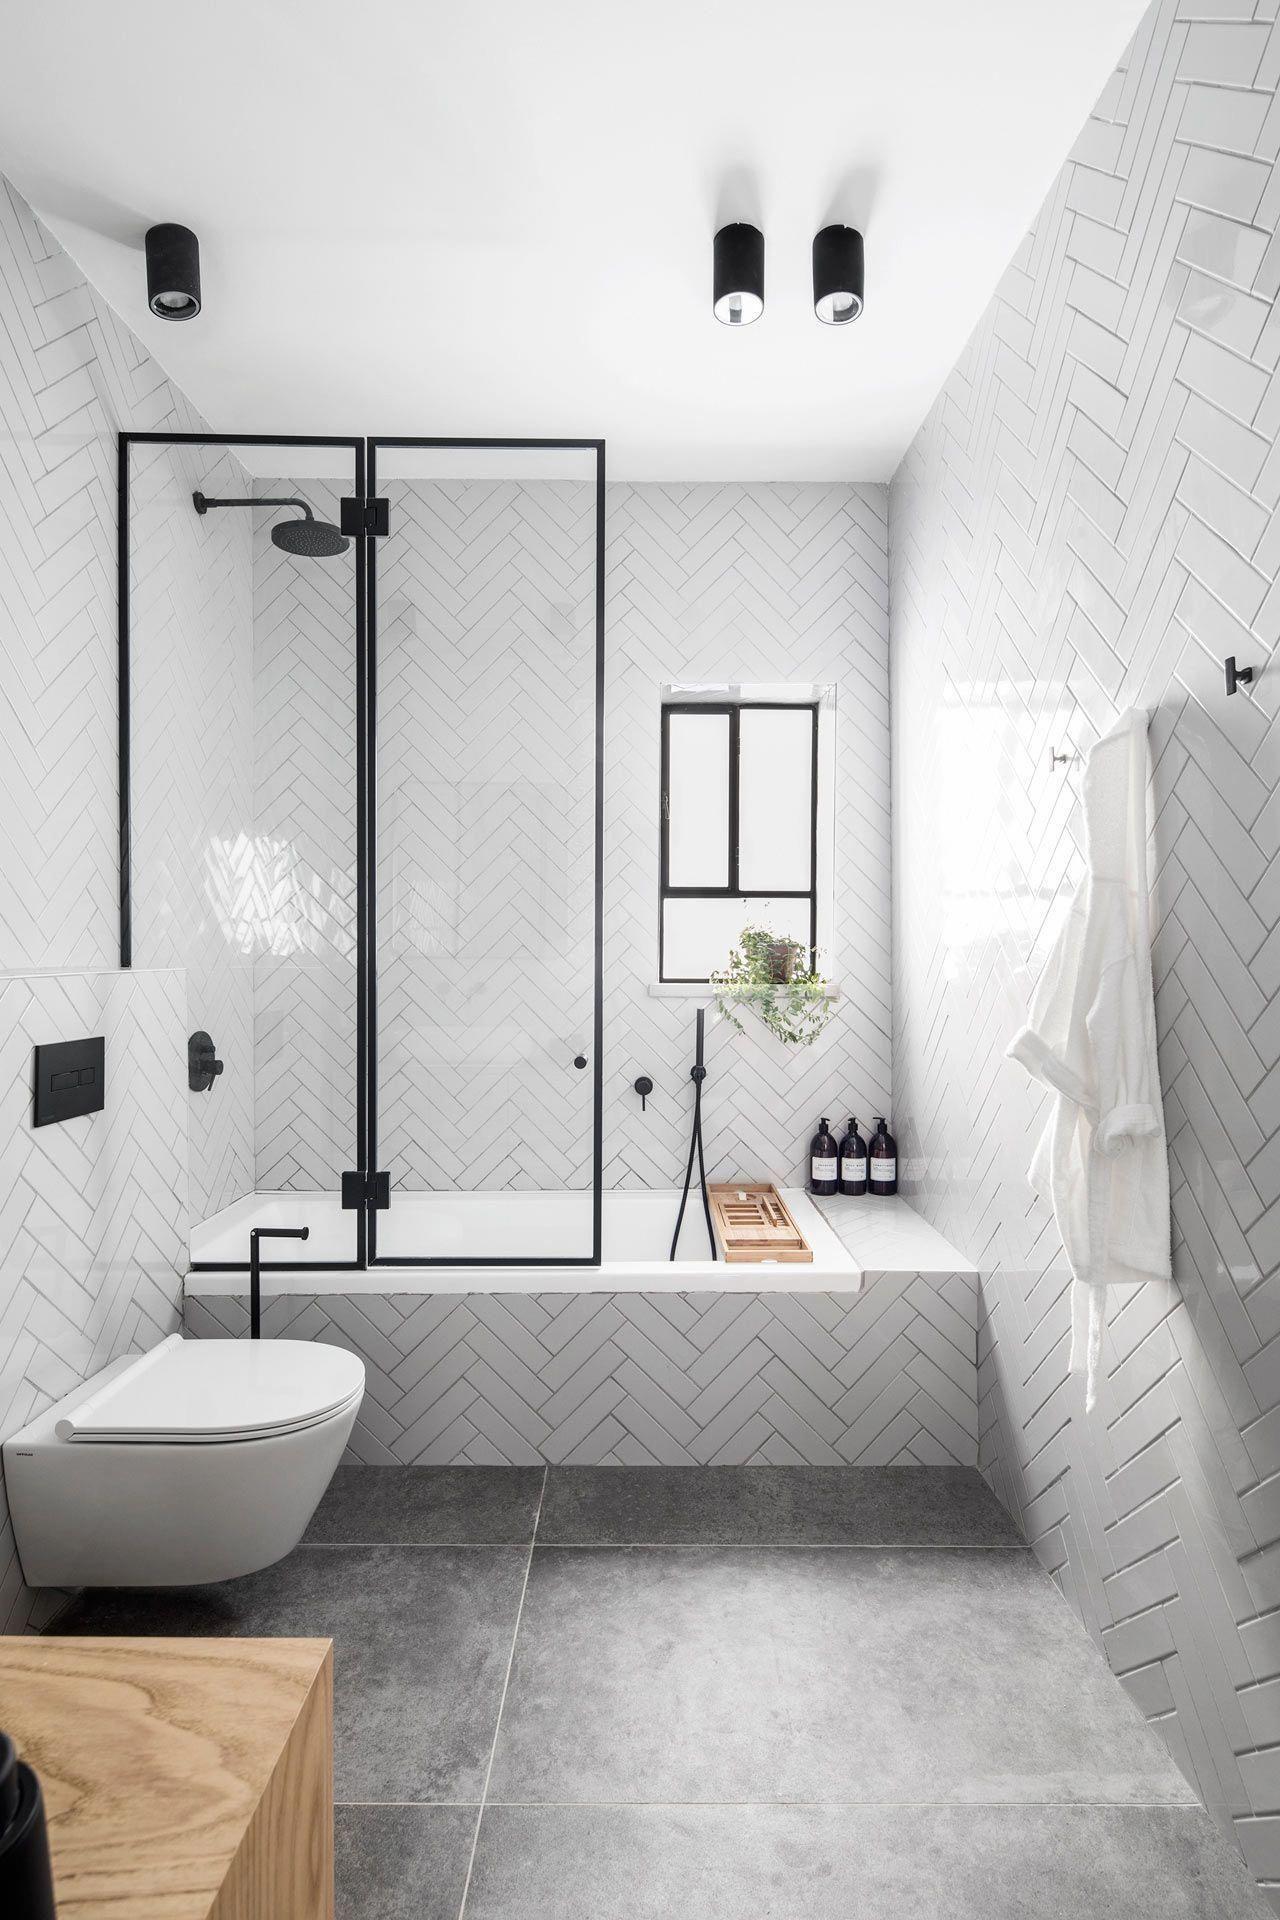 Decoratingbathrooms Modern Bathroom Bathroom Design Small Bathroom Simple interior bathroom design